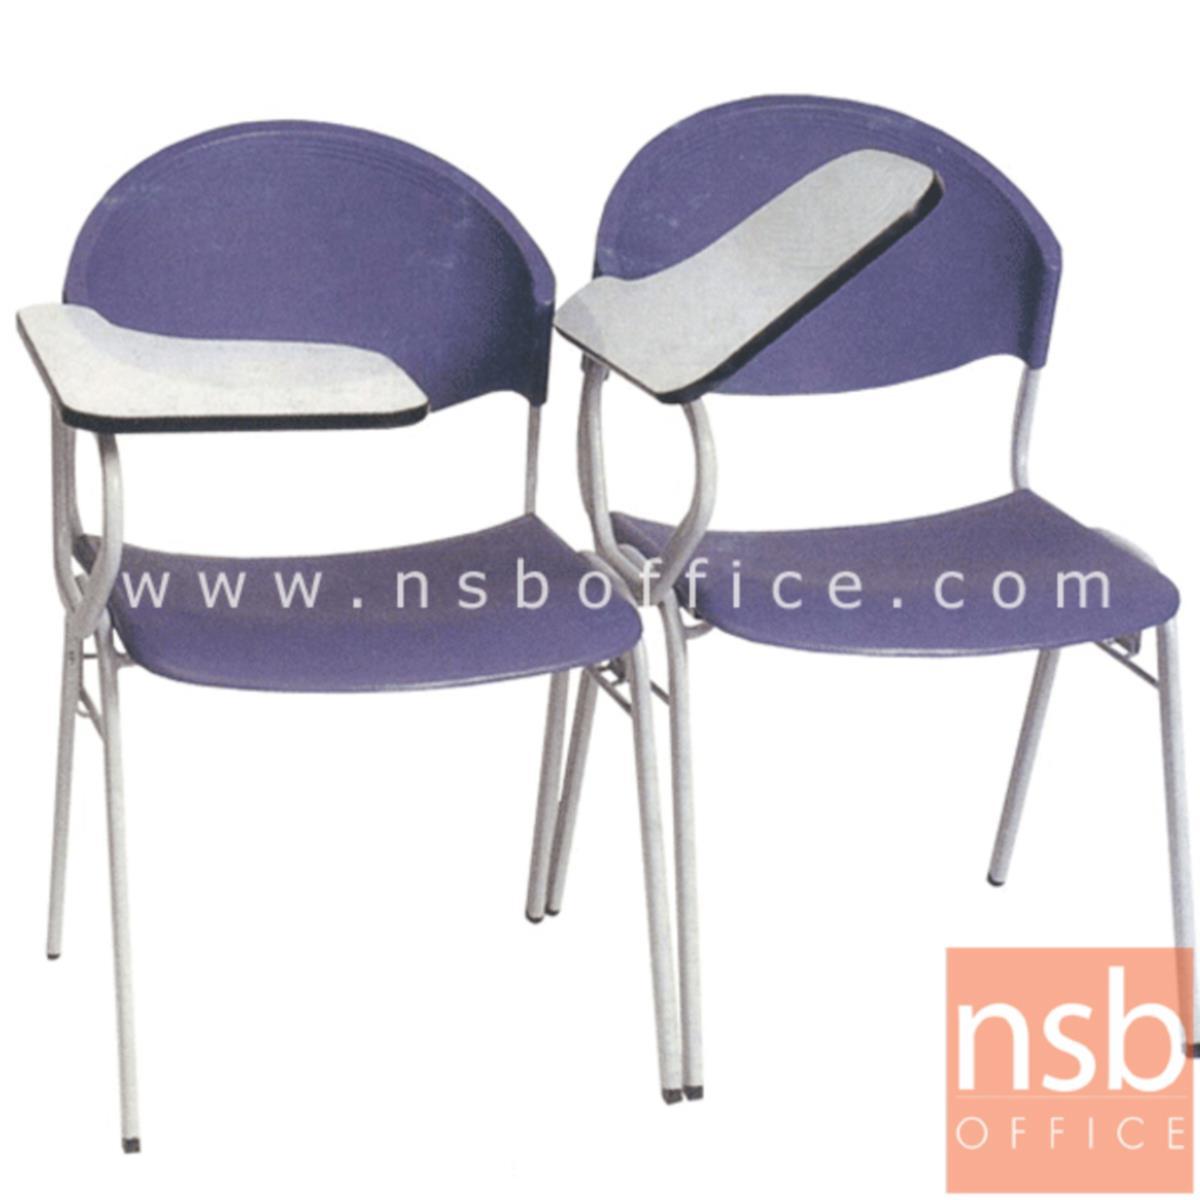 B07A044:เก้าอี้เลคเชอร์เฟรมโพลี่ รุ่น C3-680 ขาเหล็กพ่นสี